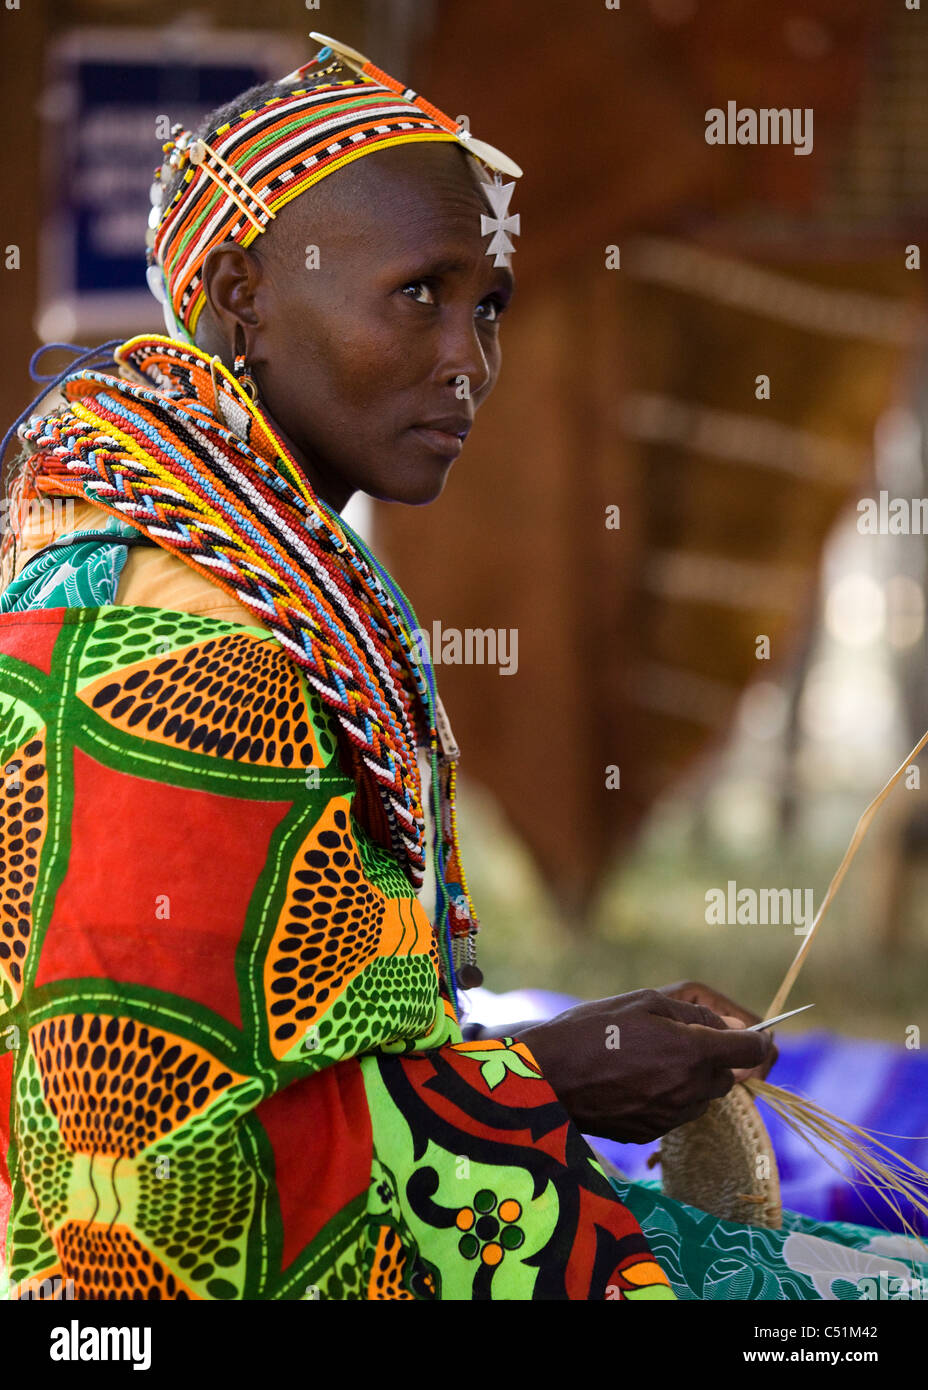 A Kenyan woman in traditional dress weaving a basket Stock Photo